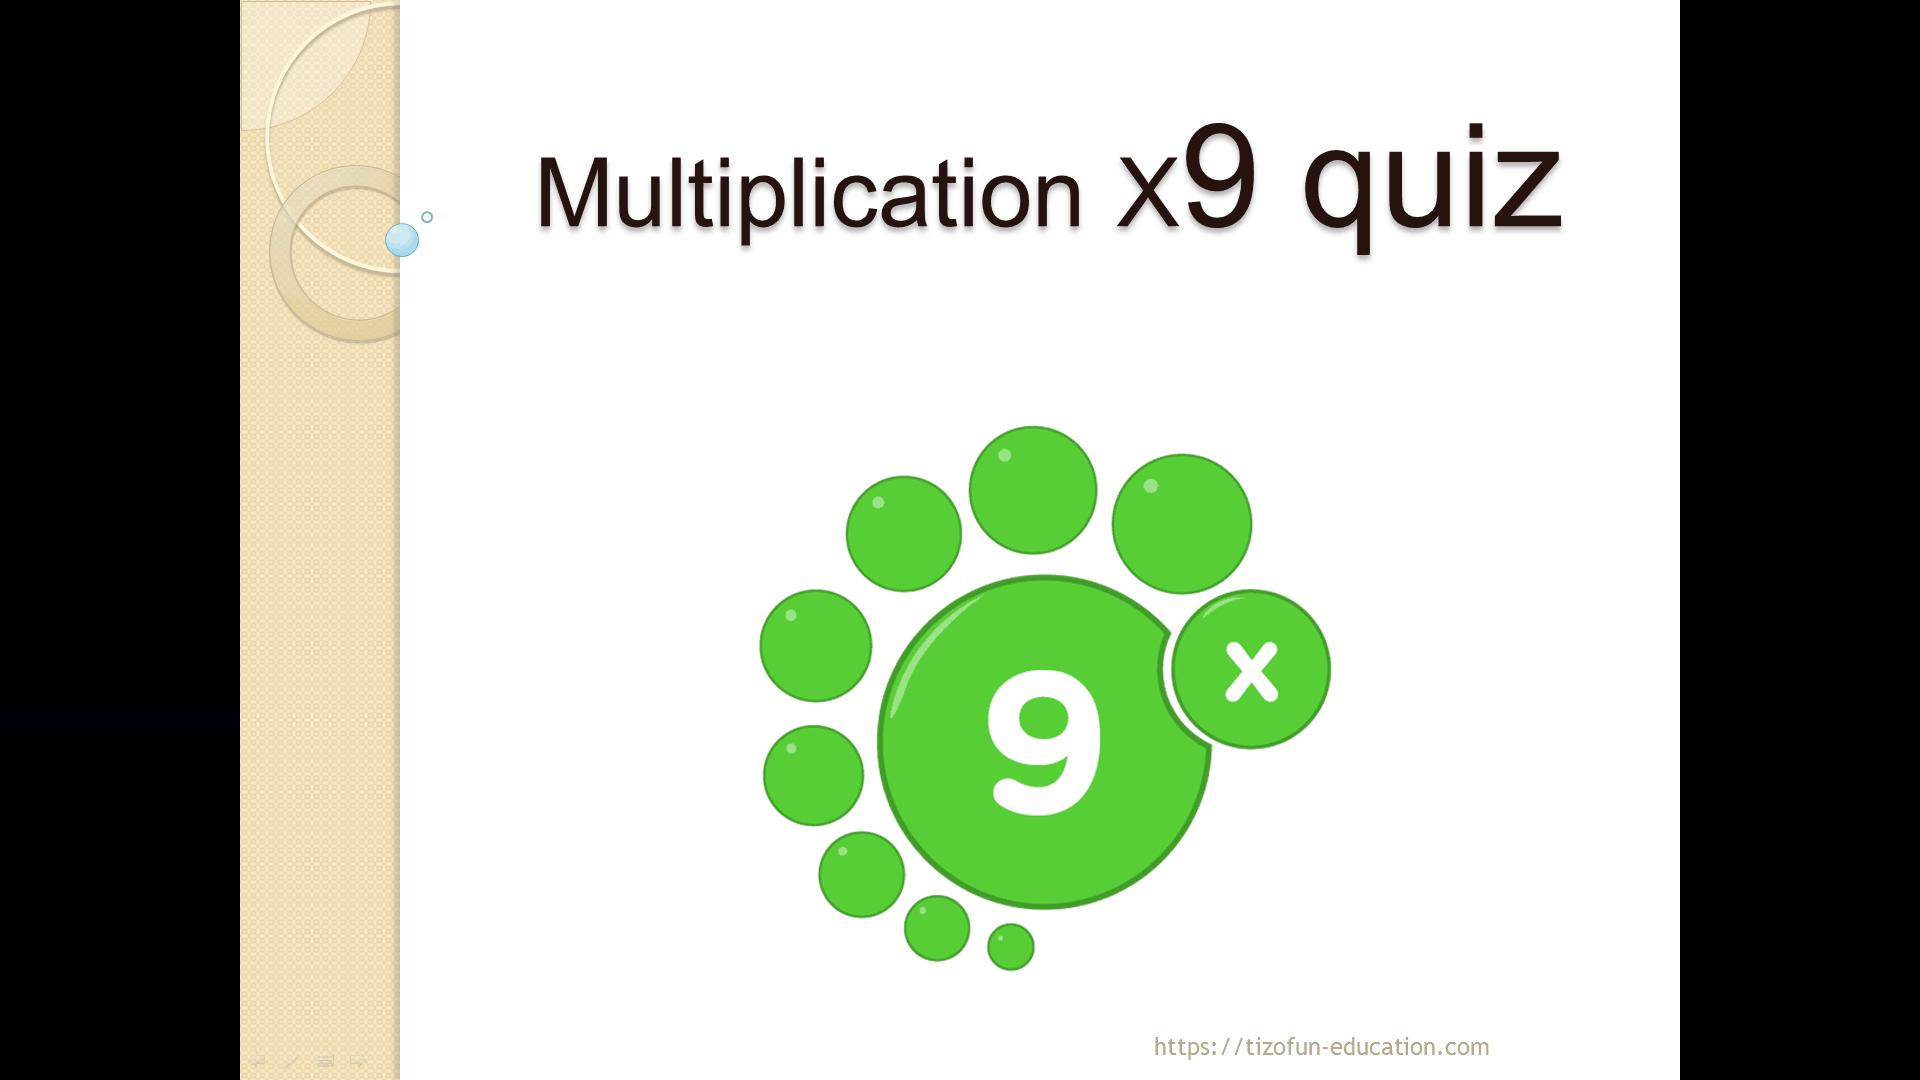 Pin on Multiplication - Apprendre les tables de multiplication